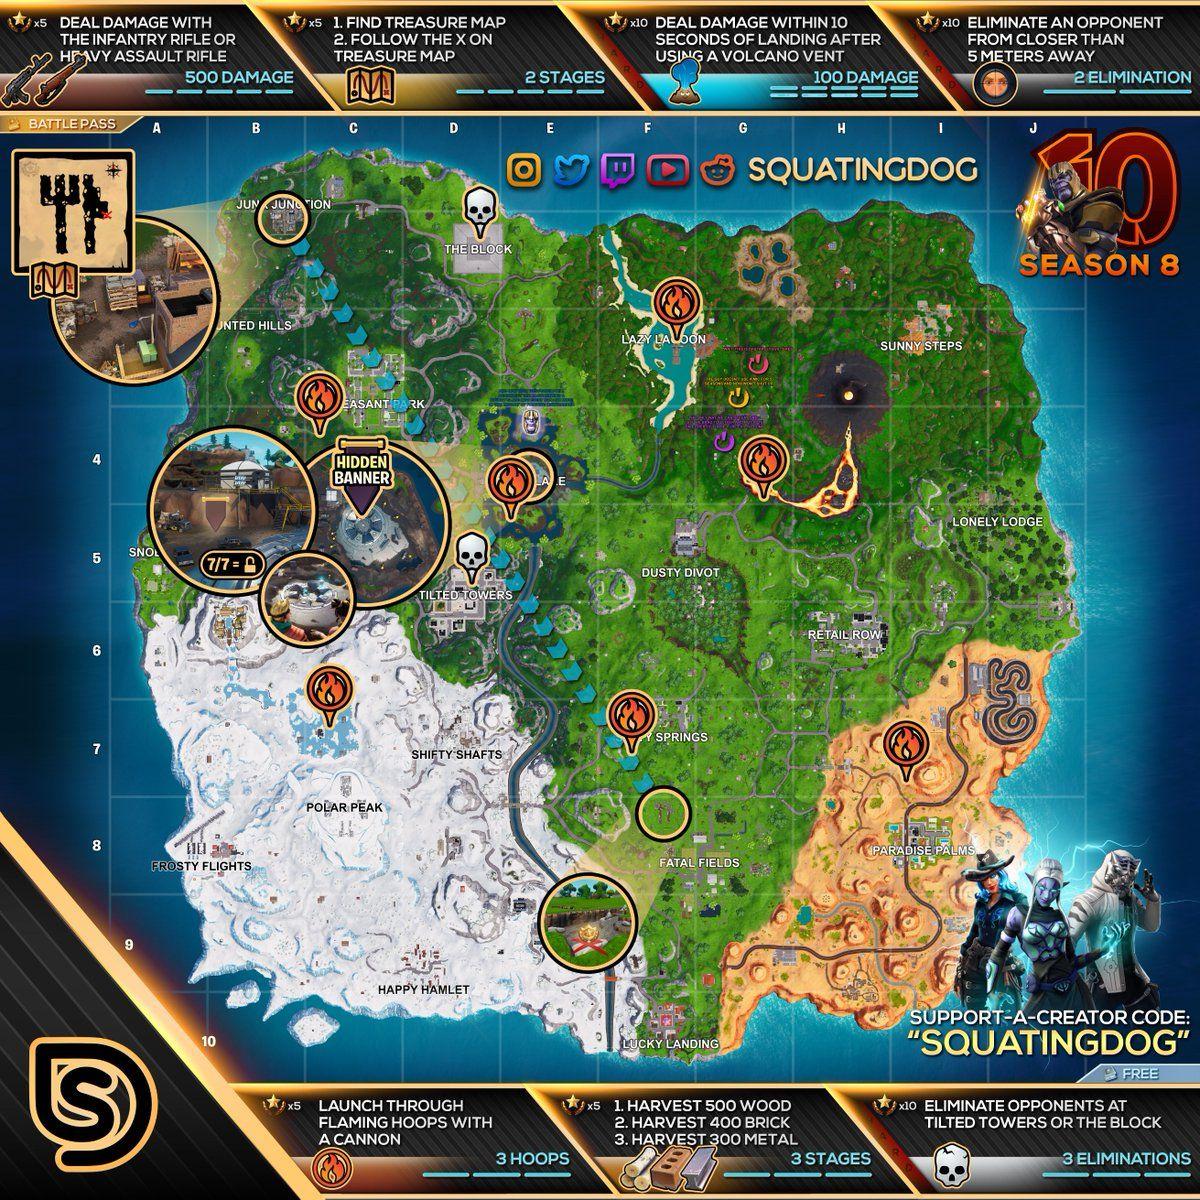 Fortnite Cheat Sheet Map For Season 8 Week 10 Challenges